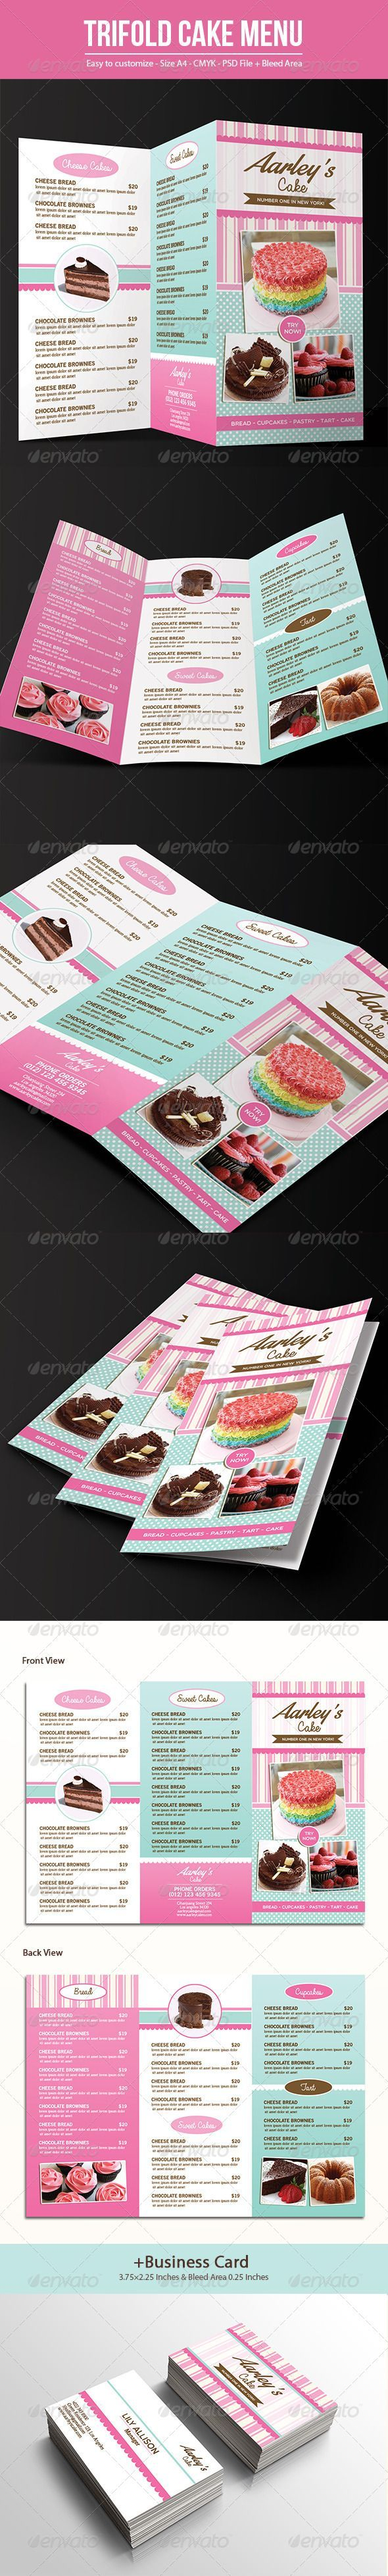 Trifold cake menu business card menu business cards and card trifold cake menu business card template design speisekarte download graphicriver accmission Choice Image